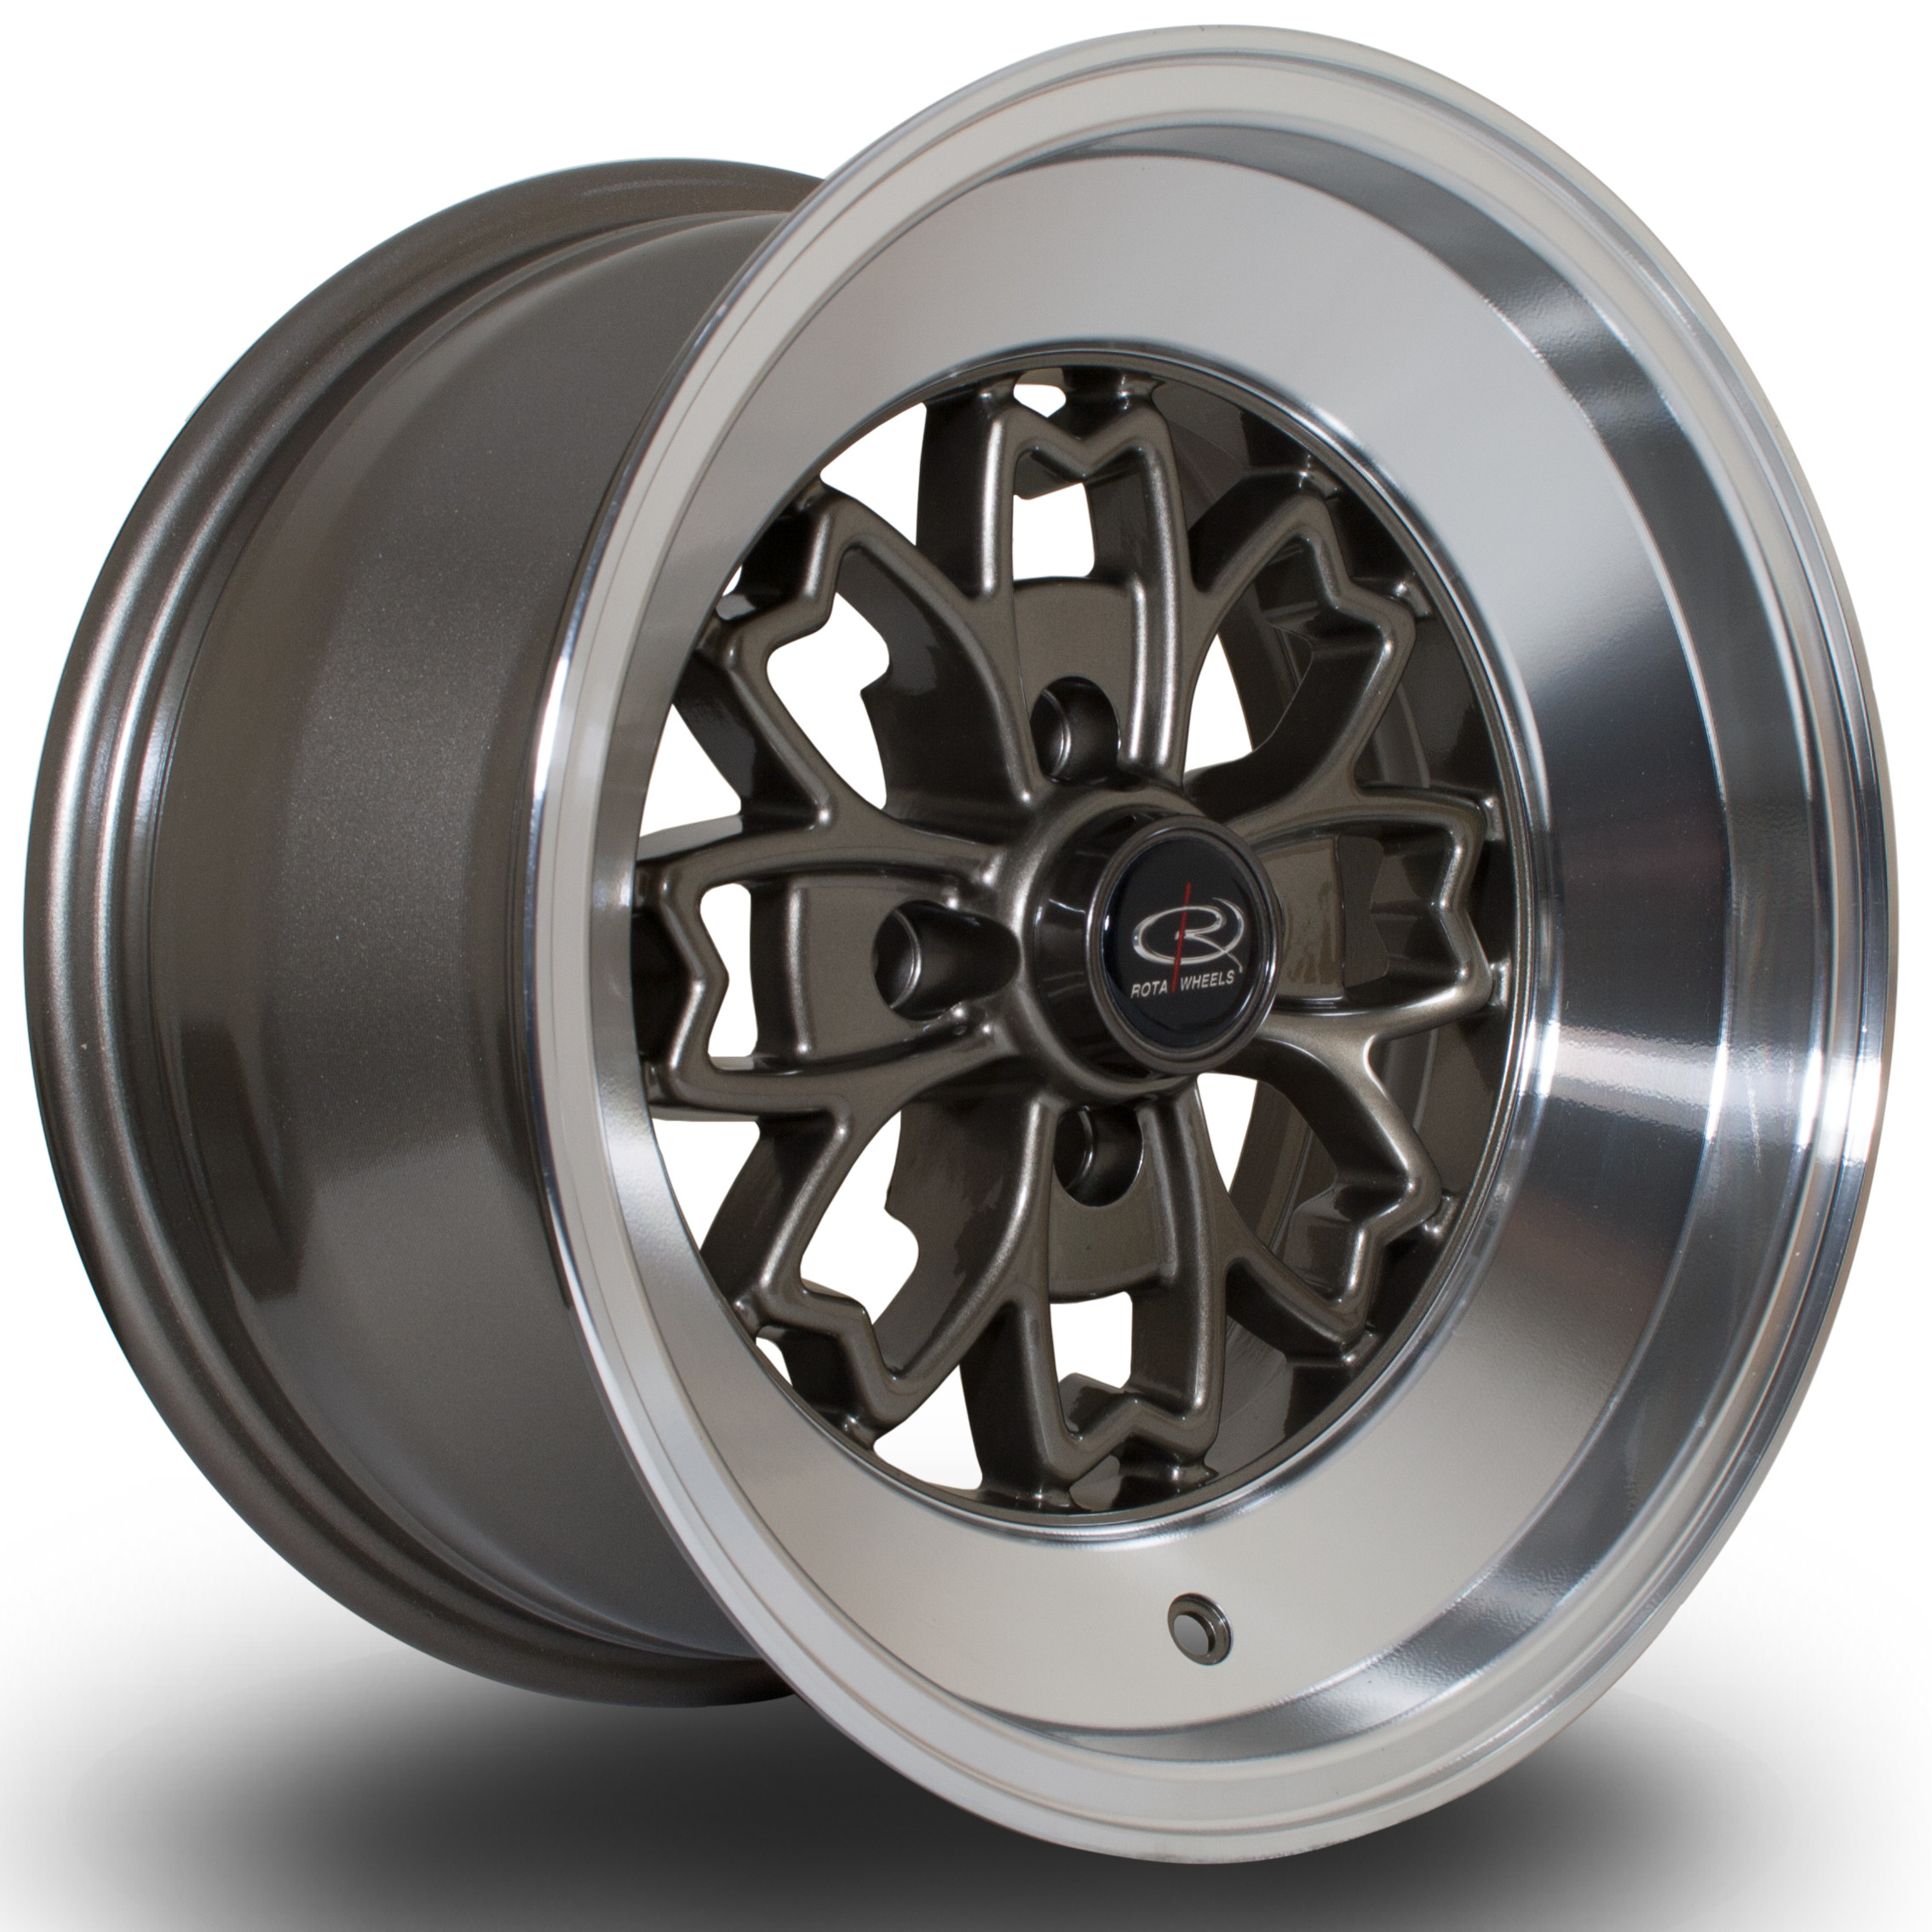 Aleica 15x8 4x100 ET0 Bronze with Polished Lip - Rota Wheels